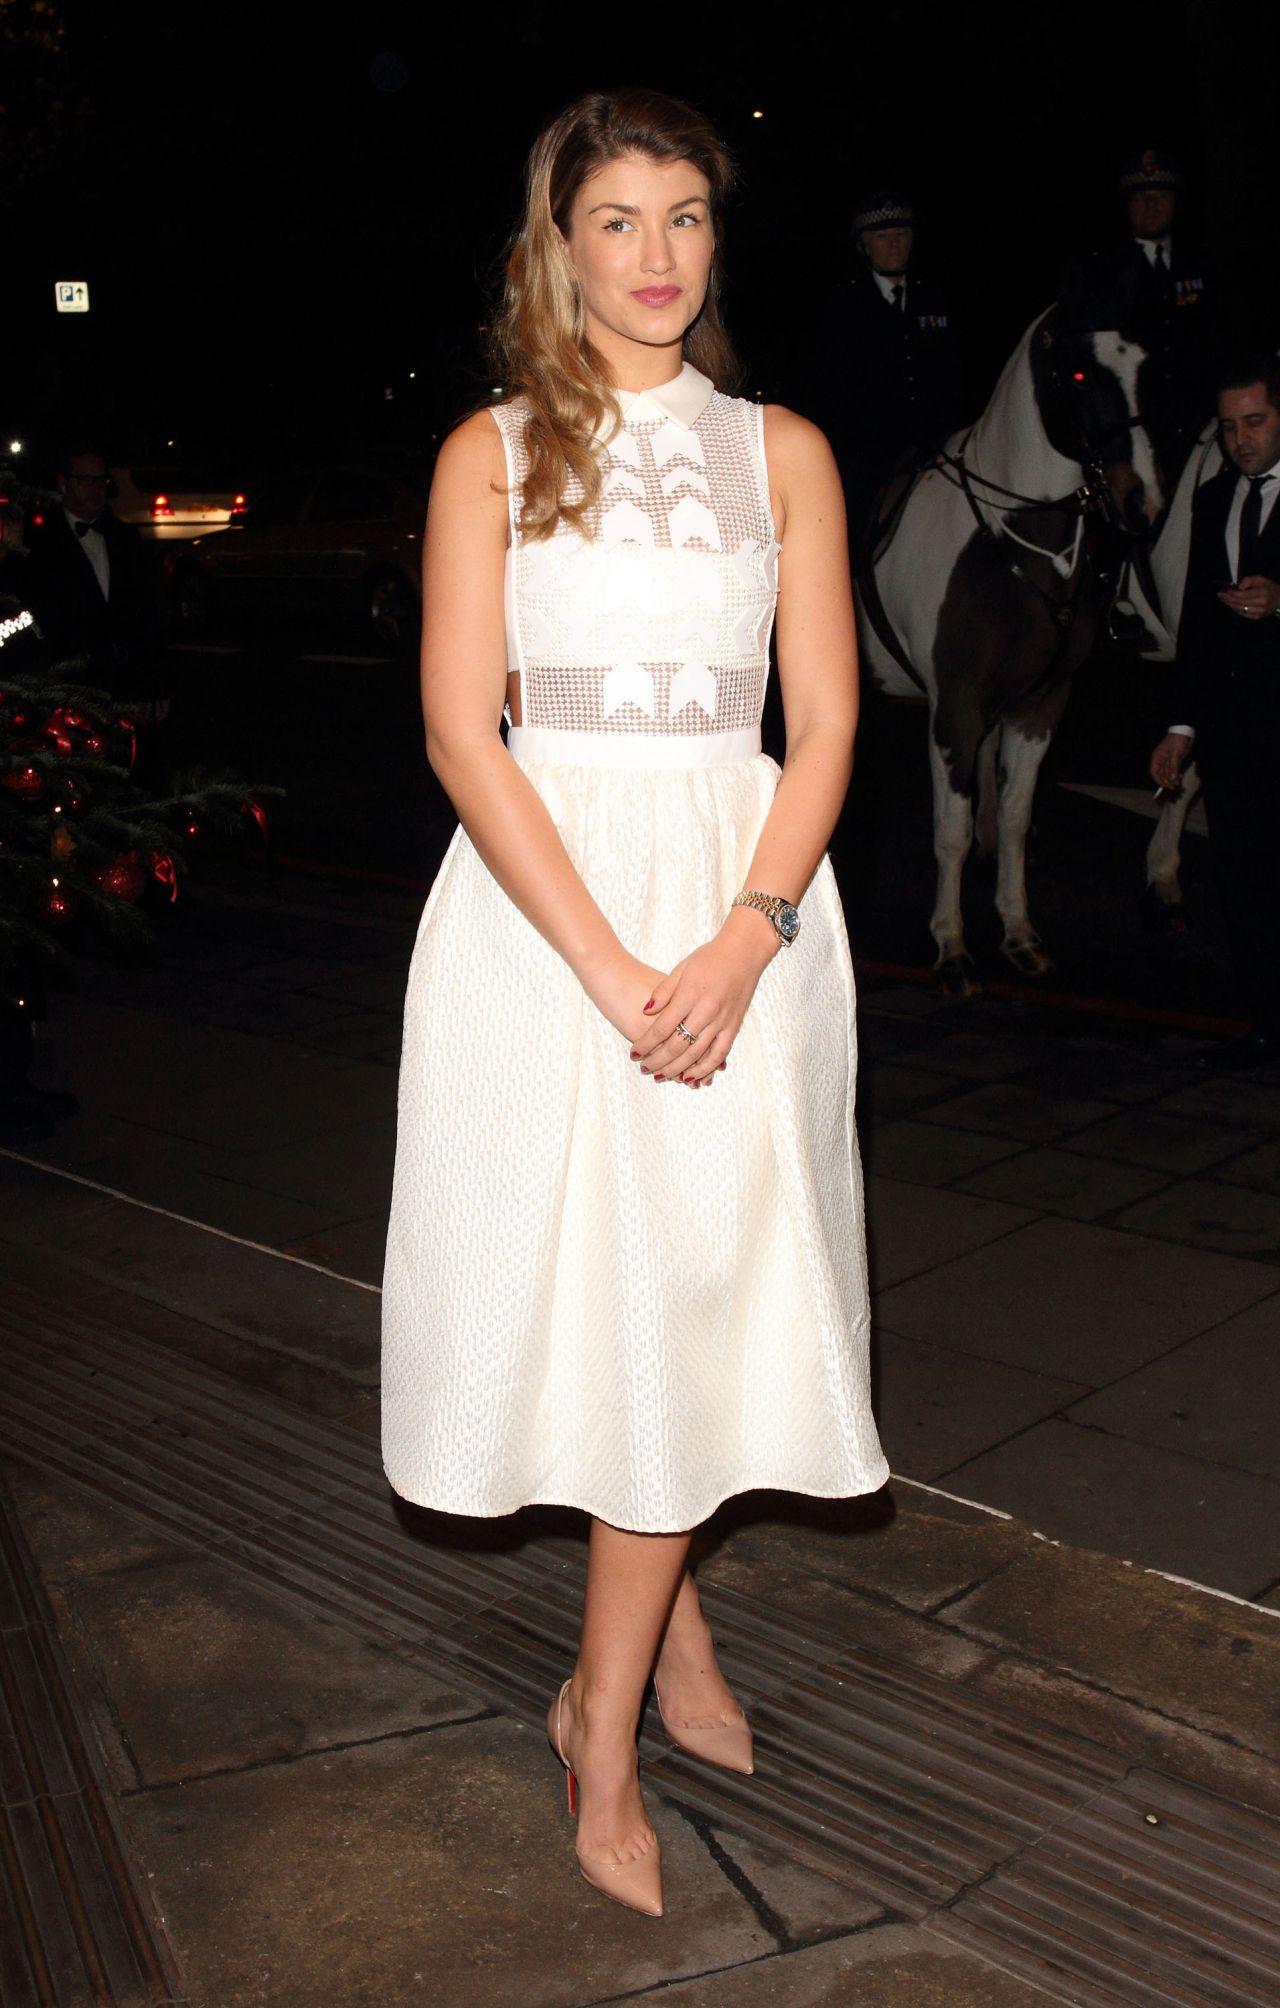 Amy Willerton in White Dress - Daily Mirror & RSPCA Animal Hero 2014 Awards in London